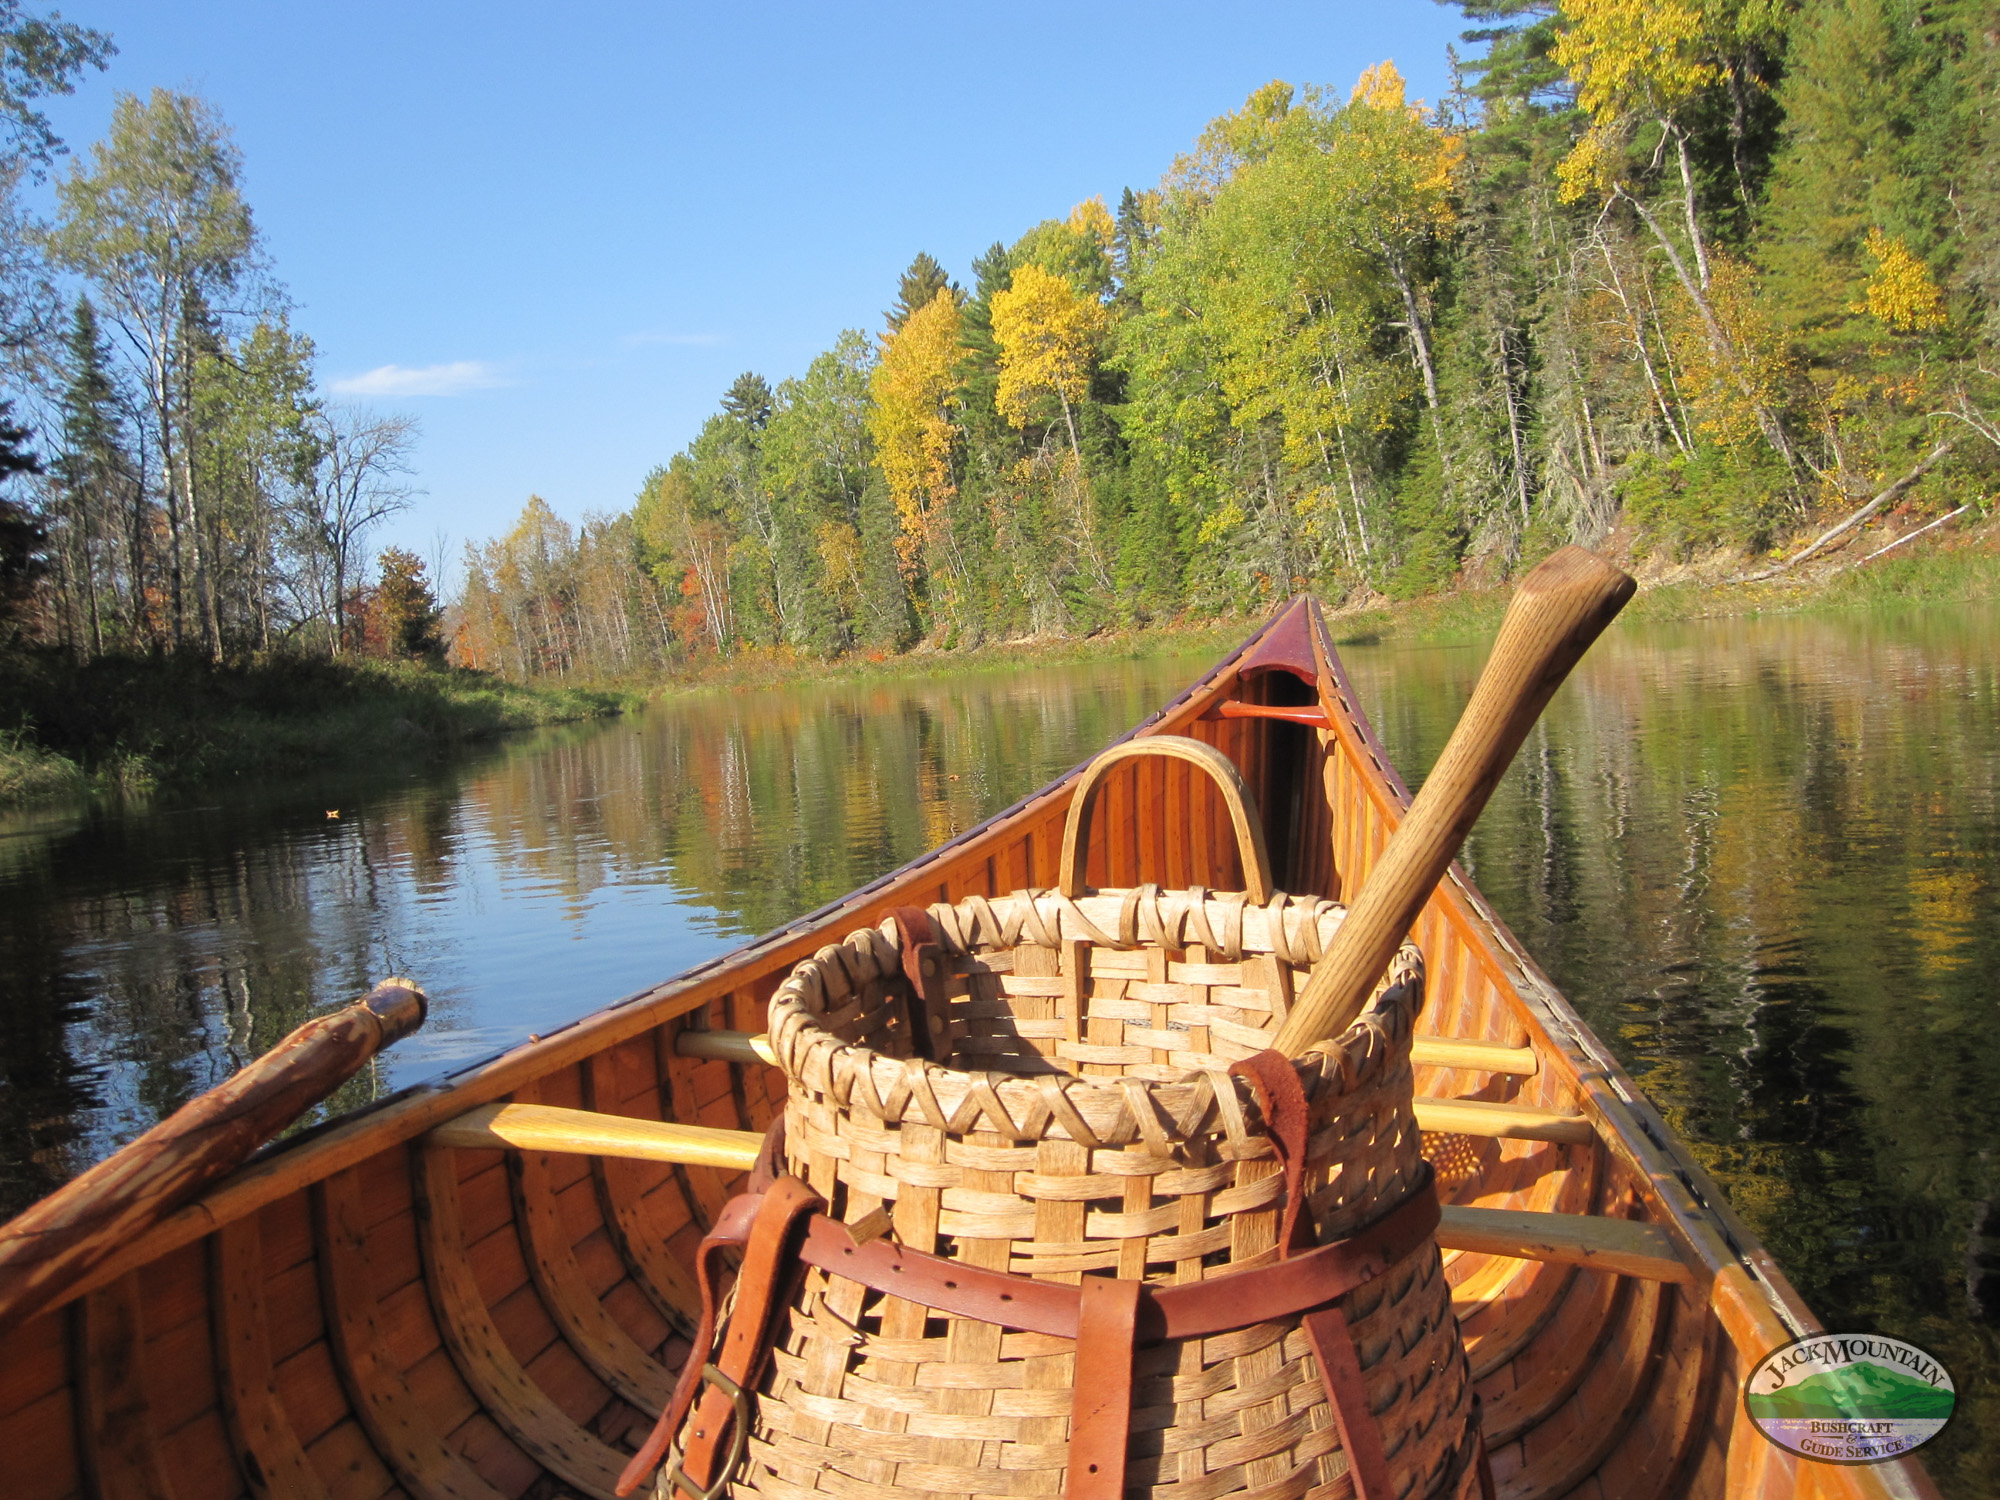 Wood Canoe & Basket SCS